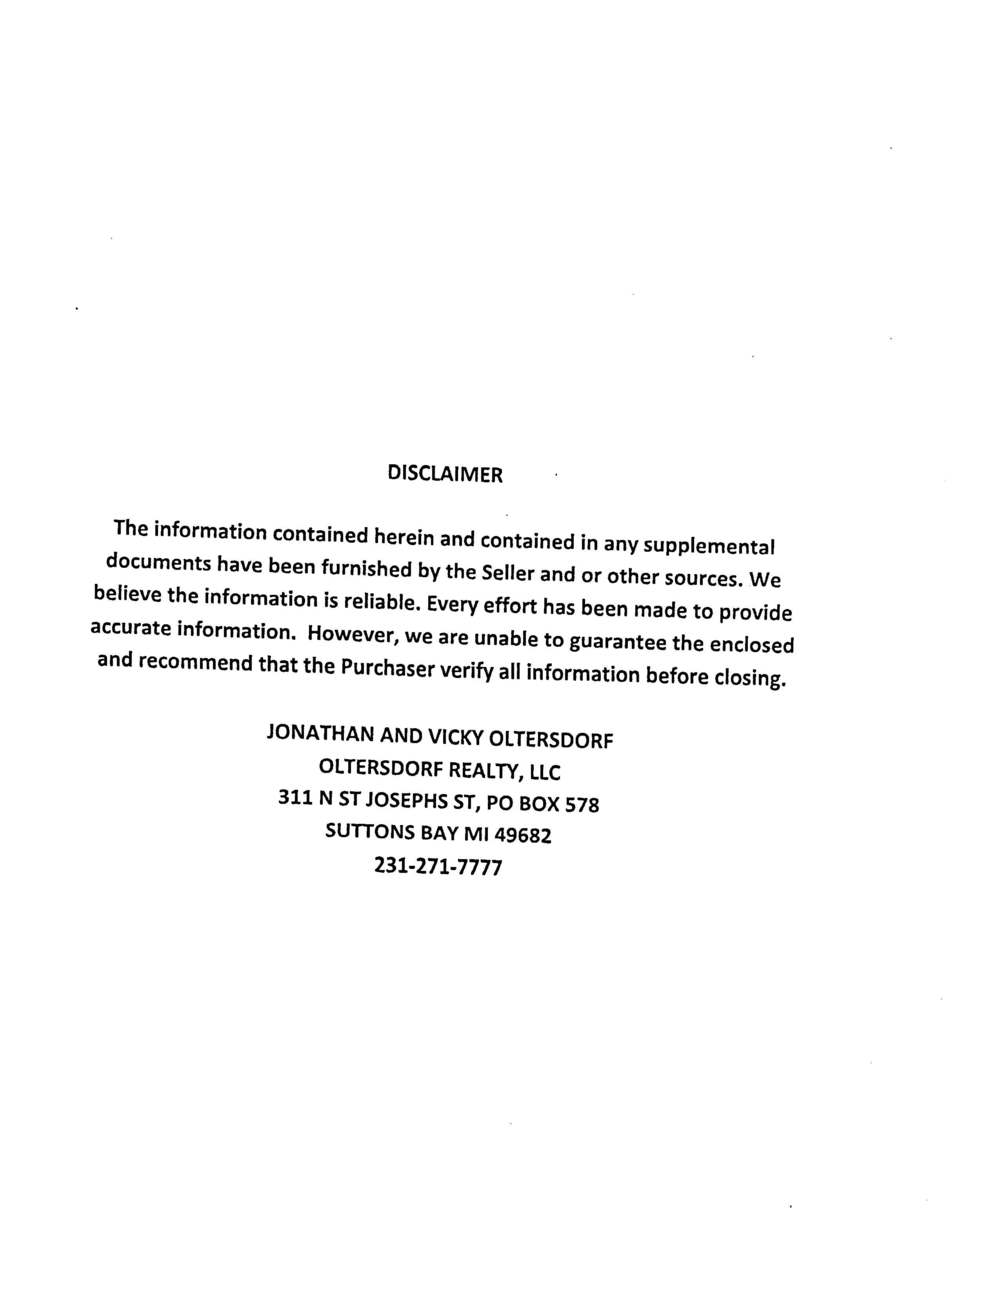 7251 E Alpers Road, Lake Leelanau, MI – Historic 1865 Centennial Inn For Sale By Oltersdorf Realty LLC Information Packet (21).jpg